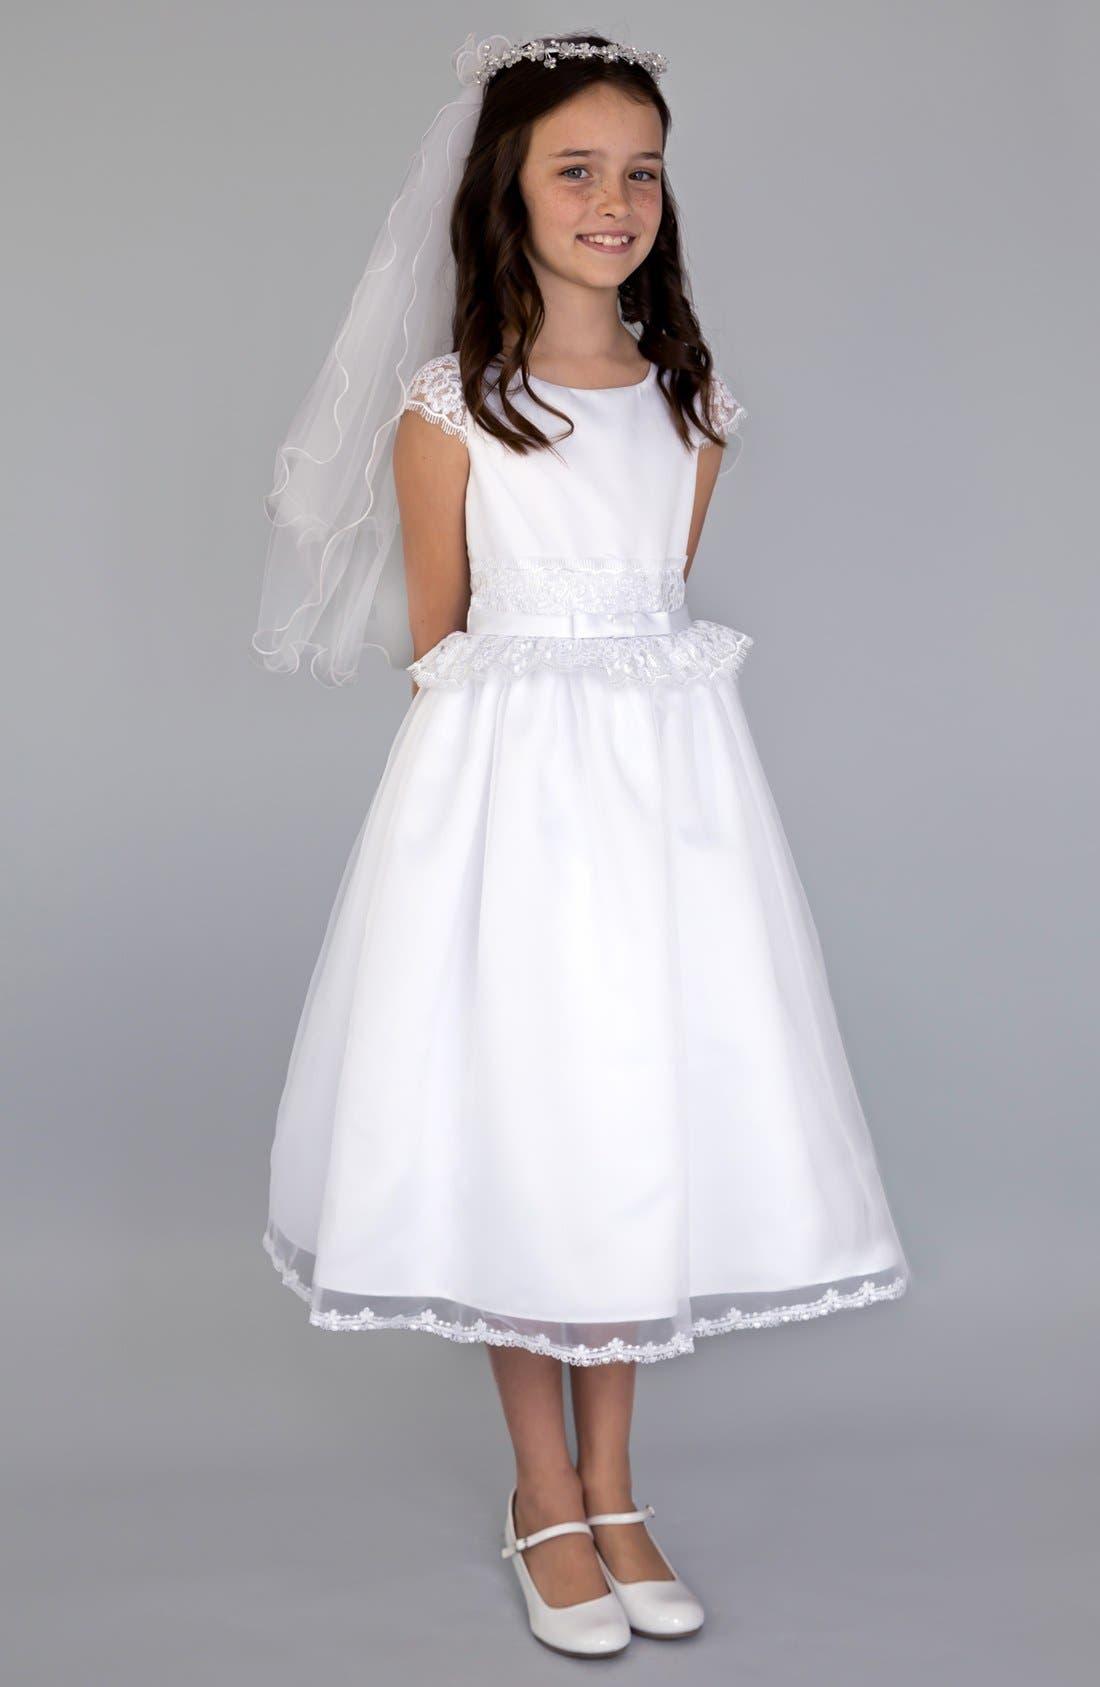 Lace Peplum Organza Dress,                             Main thumbnail 1, color,                             White